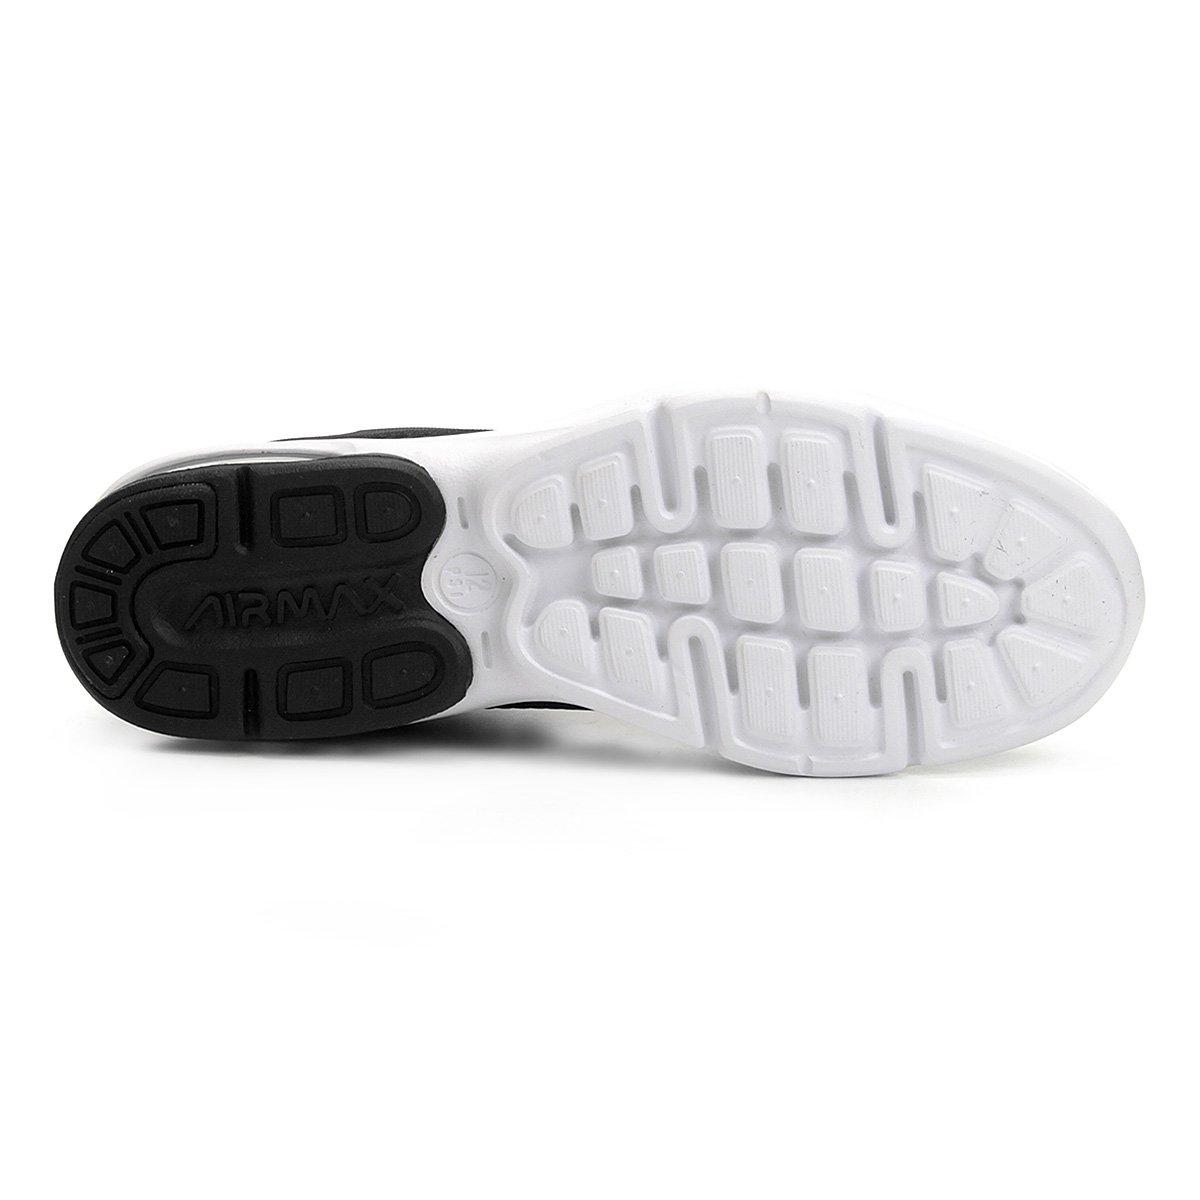 edfb41746c Tênis Nike Air Max Advantage 2 Feminino - Preto e Branco - Compre ...